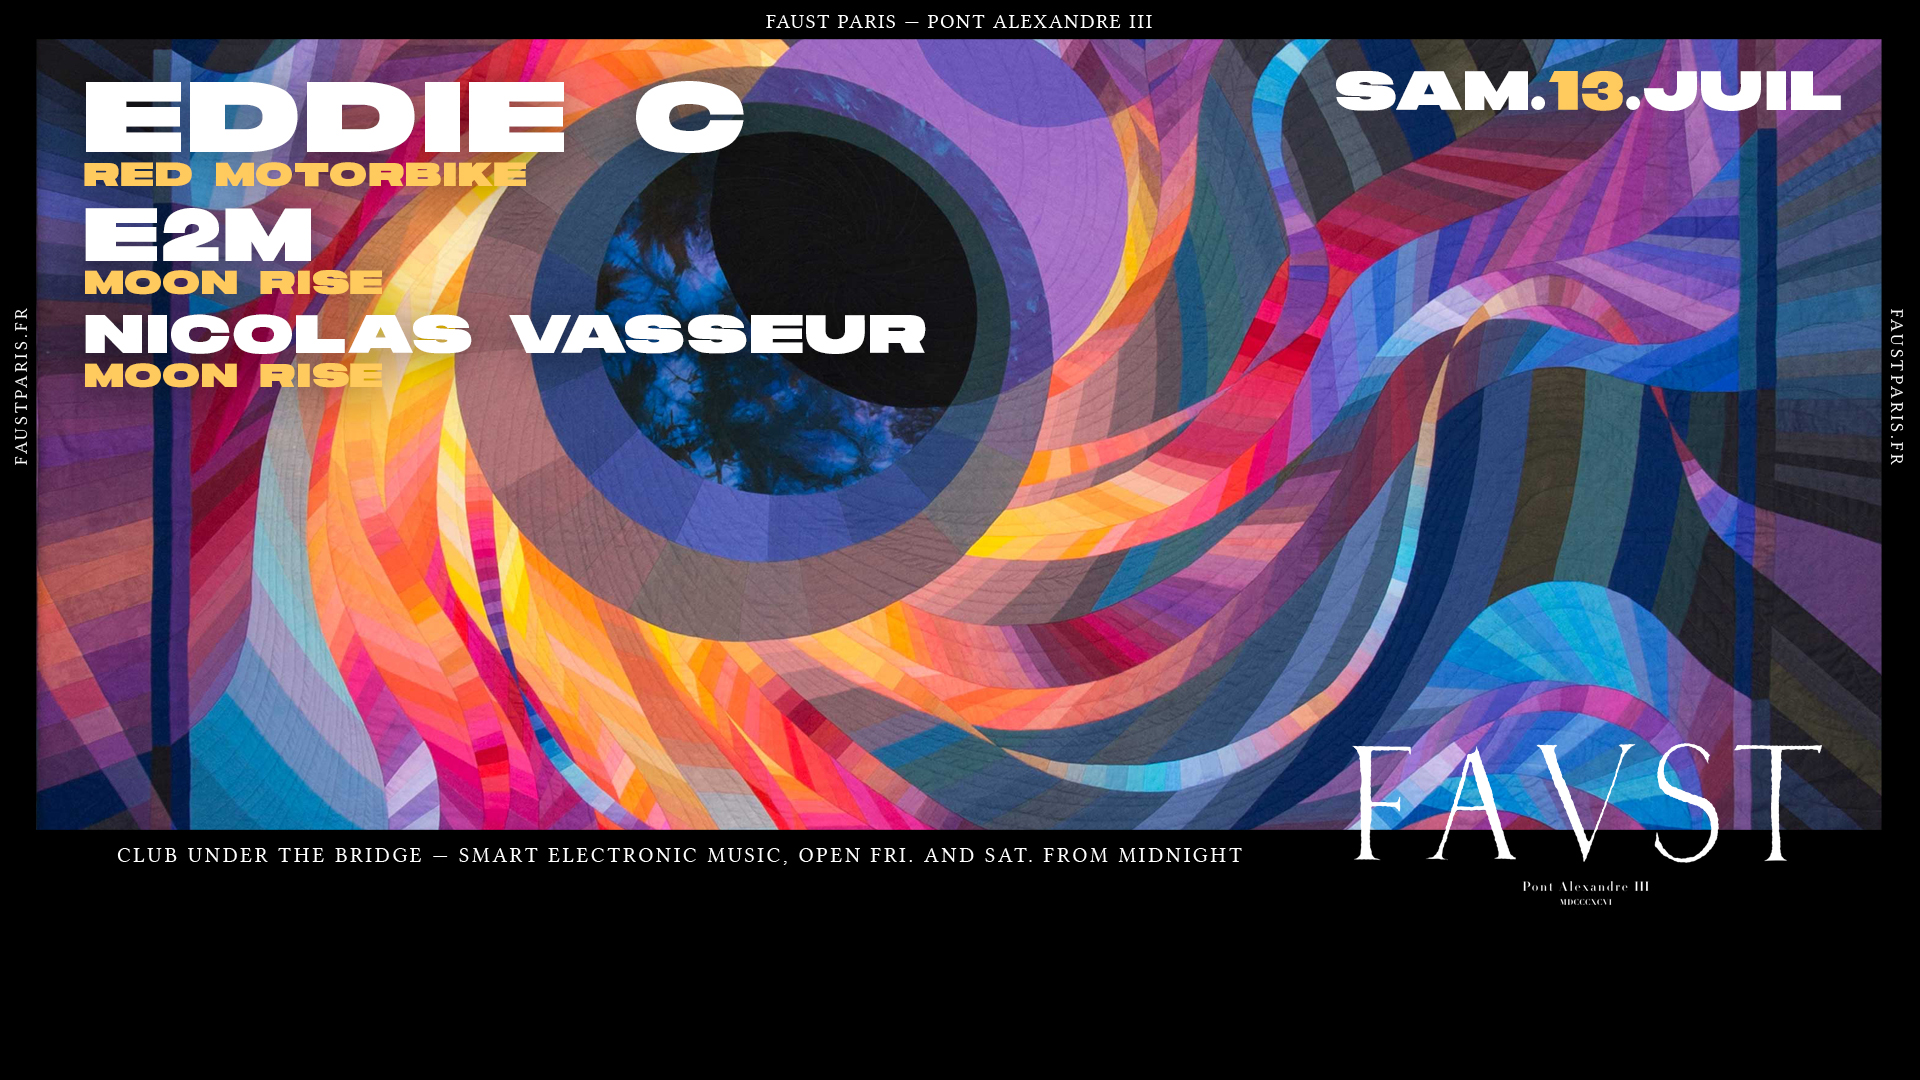 Faust w/ Eddie C - E2M & Nicolas Vasseur